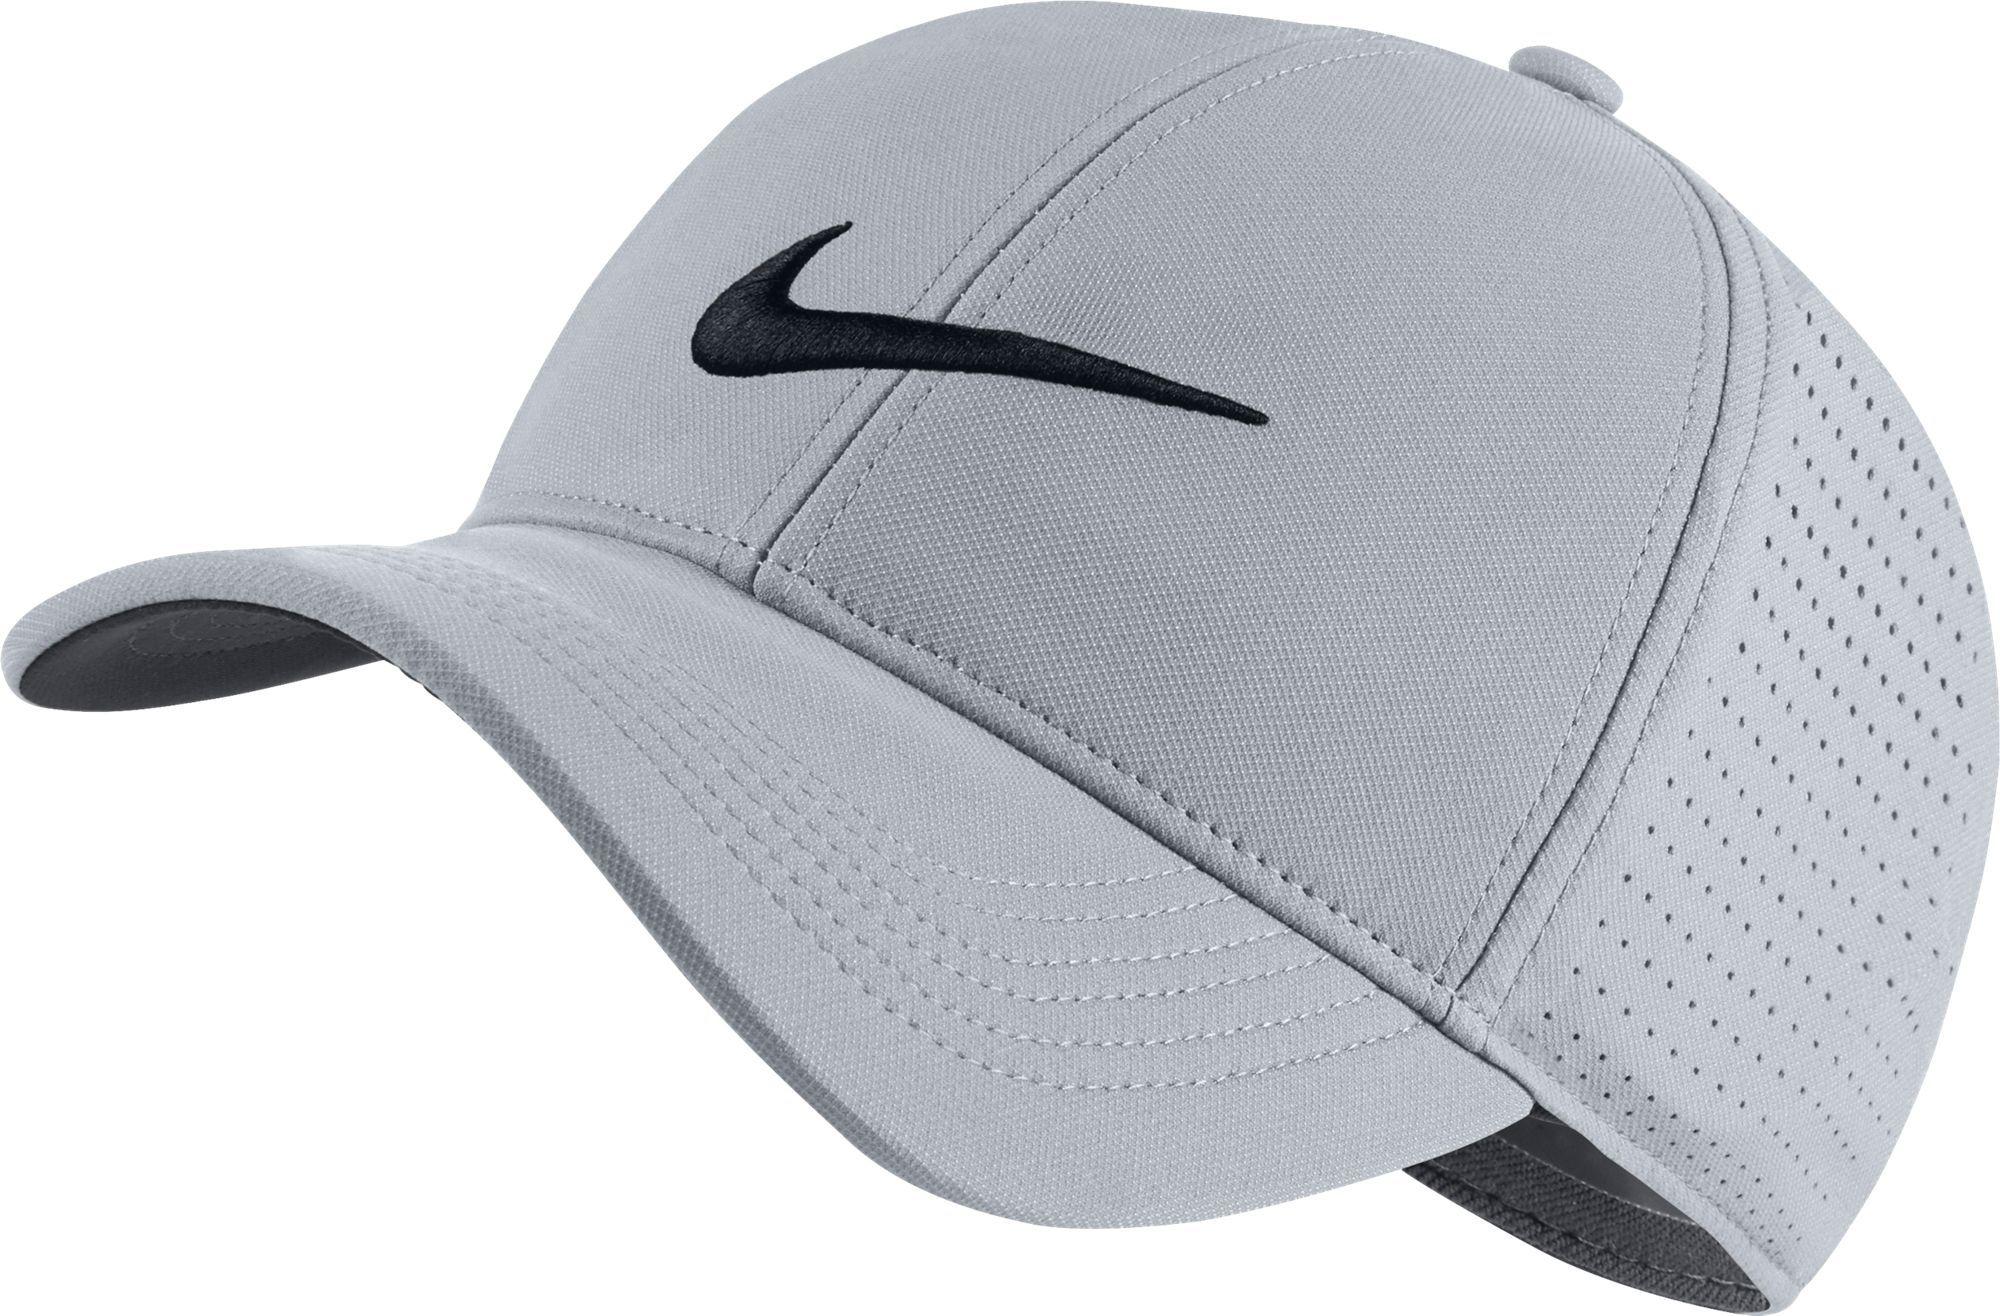 cd2c06b146d08 Nike Men s AeroBill Legacy91 Perforated Golf Hat